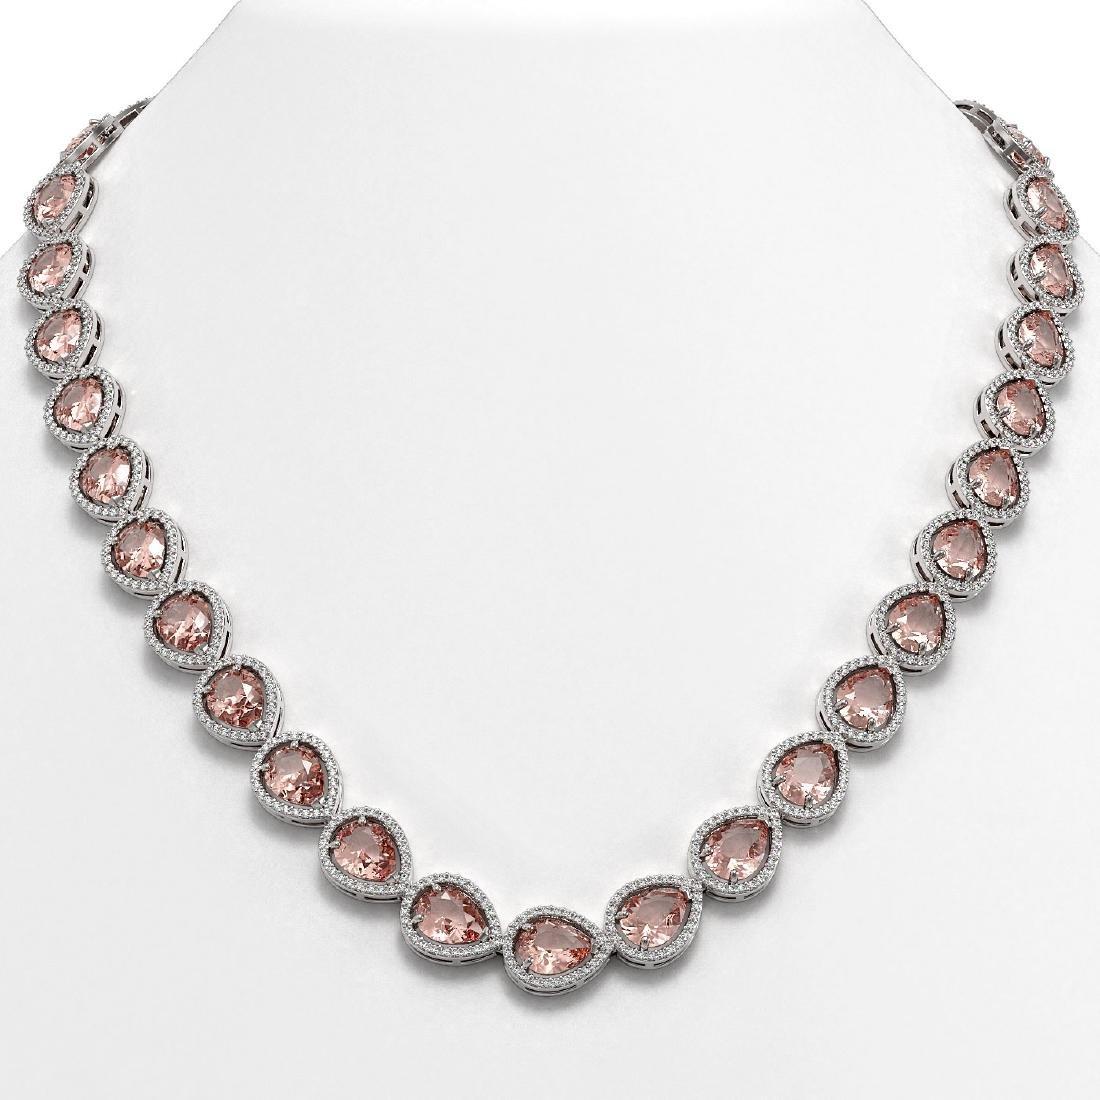 41.6 CTW Morganite & Diamond Halo Necklace 10K White